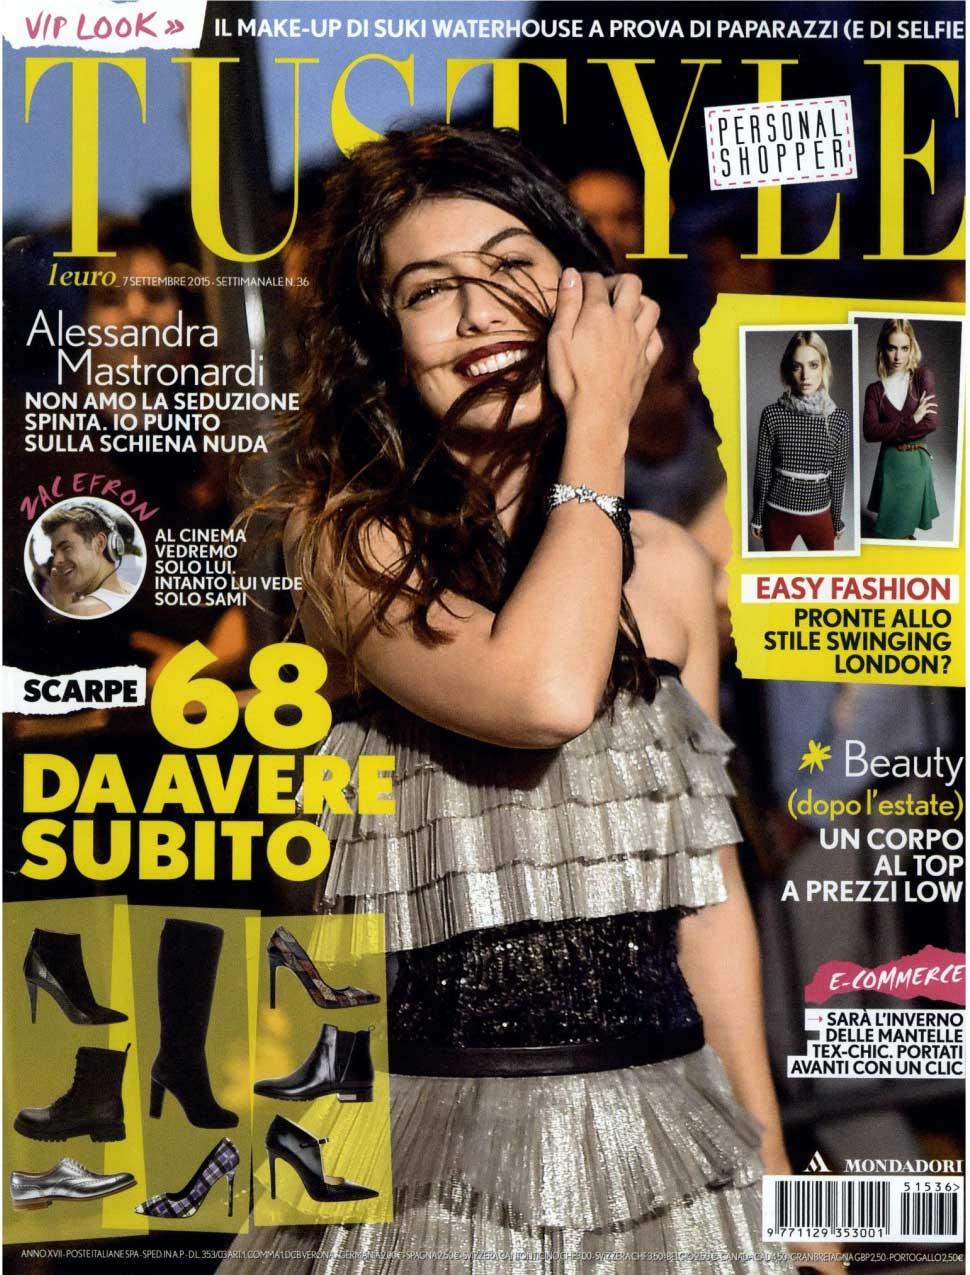 Paparazzi Lui Magazine nudes (81 photo), Topless, Cleavage, Selfie, cameltoe 2017